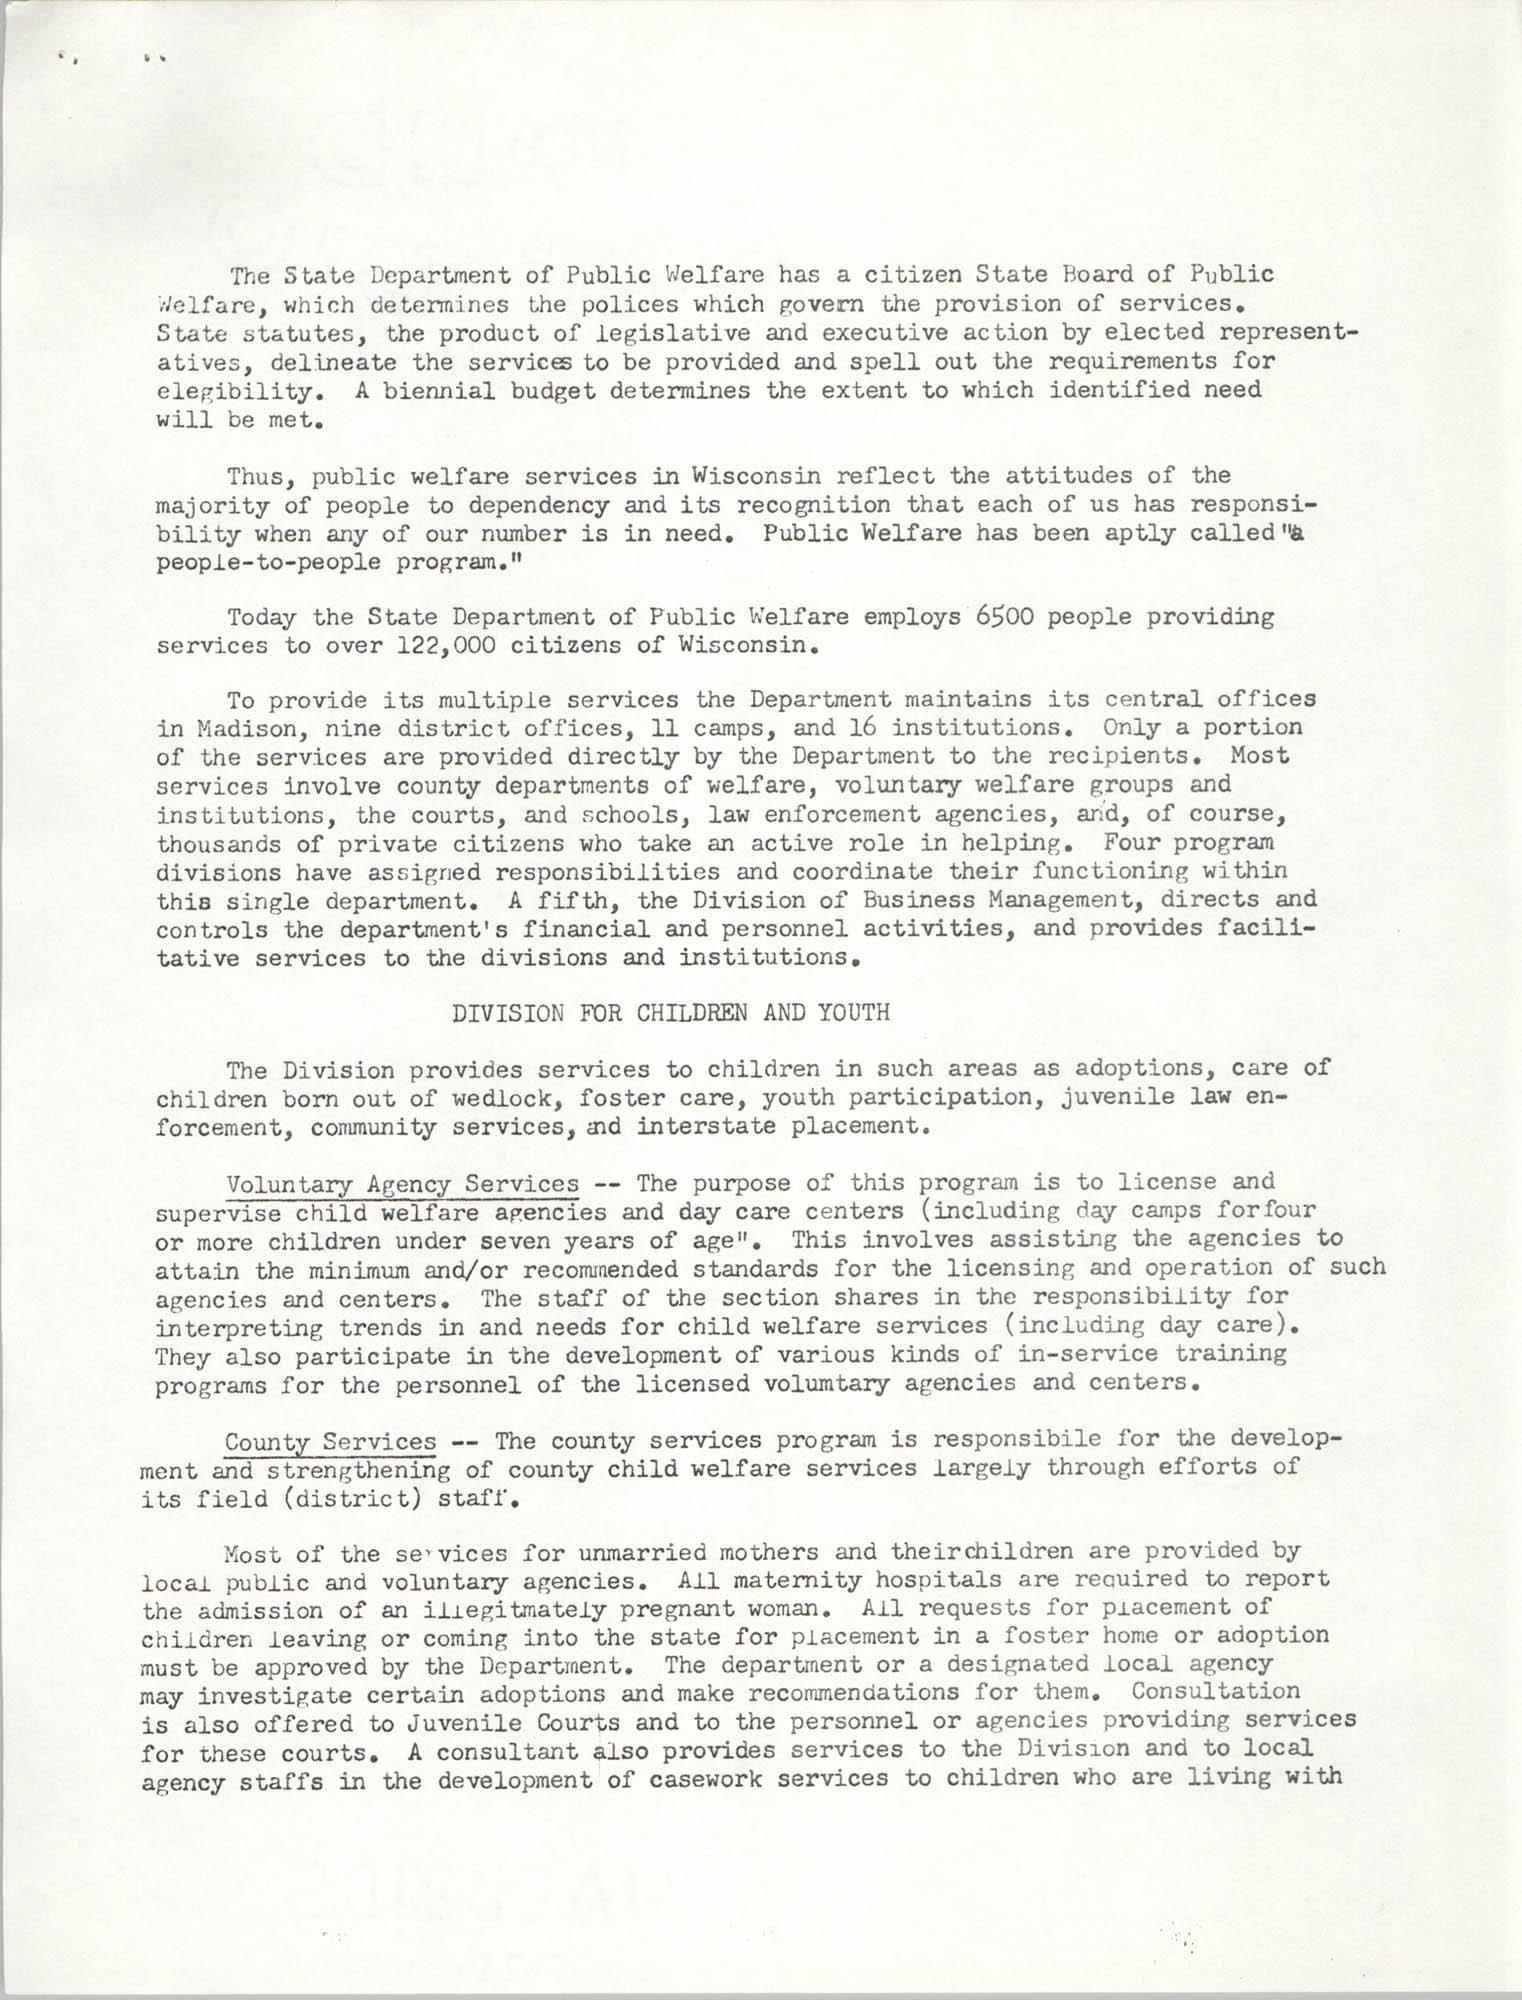 Public Welfare Programs, Page 1